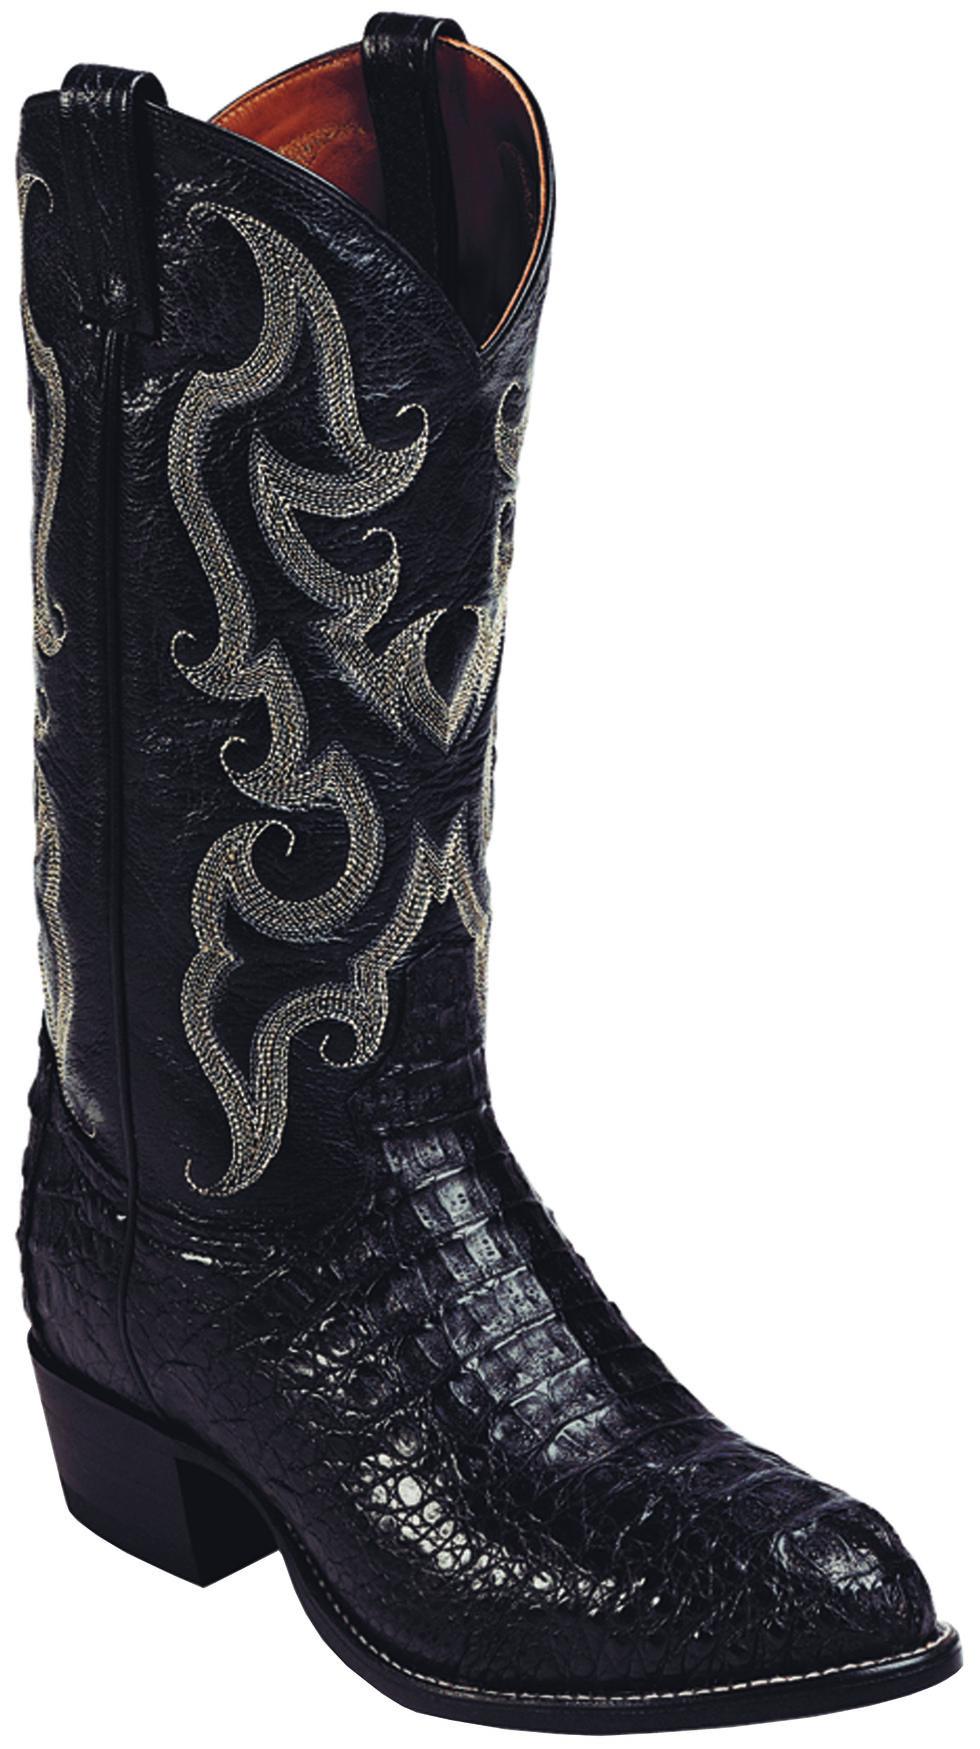 Tony Lama Black Royal Hornback Caiman Exotic Cowboy Boots - Round Toe , Black, hi-res